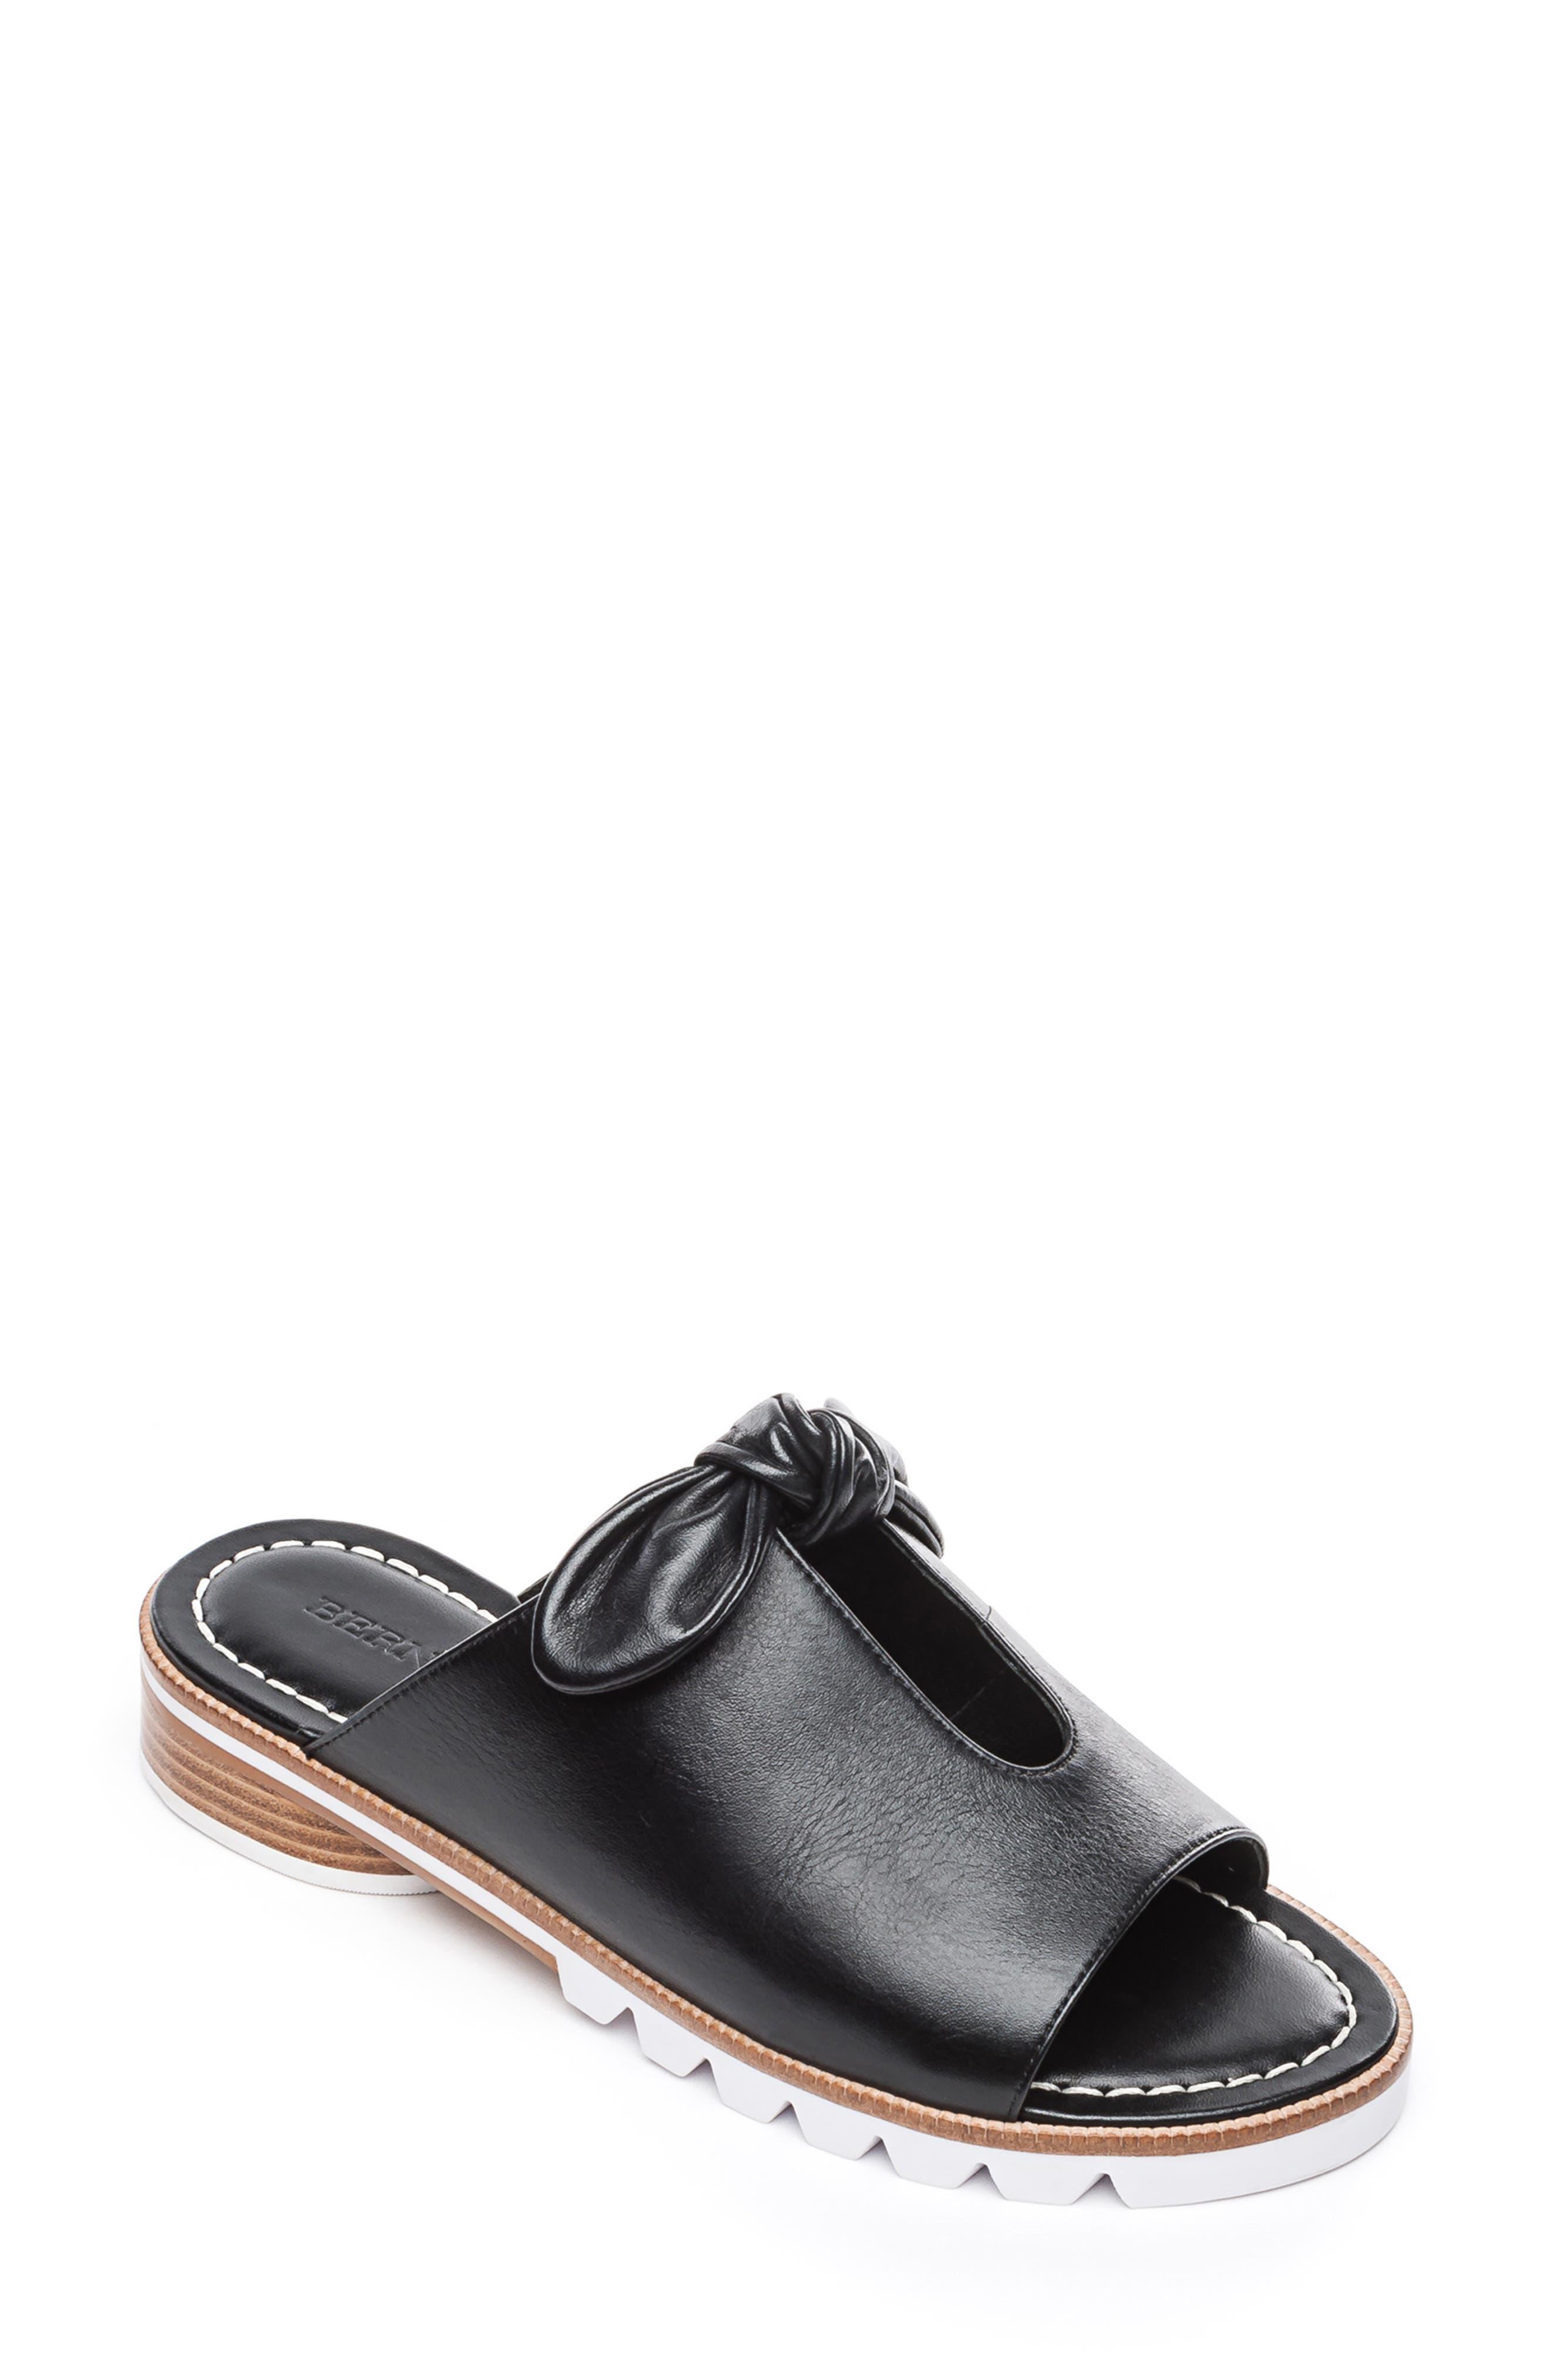 BERNARDO, Alice Bow Slide Sandal, Main thumbnail 1, color, BLACK LEATHER